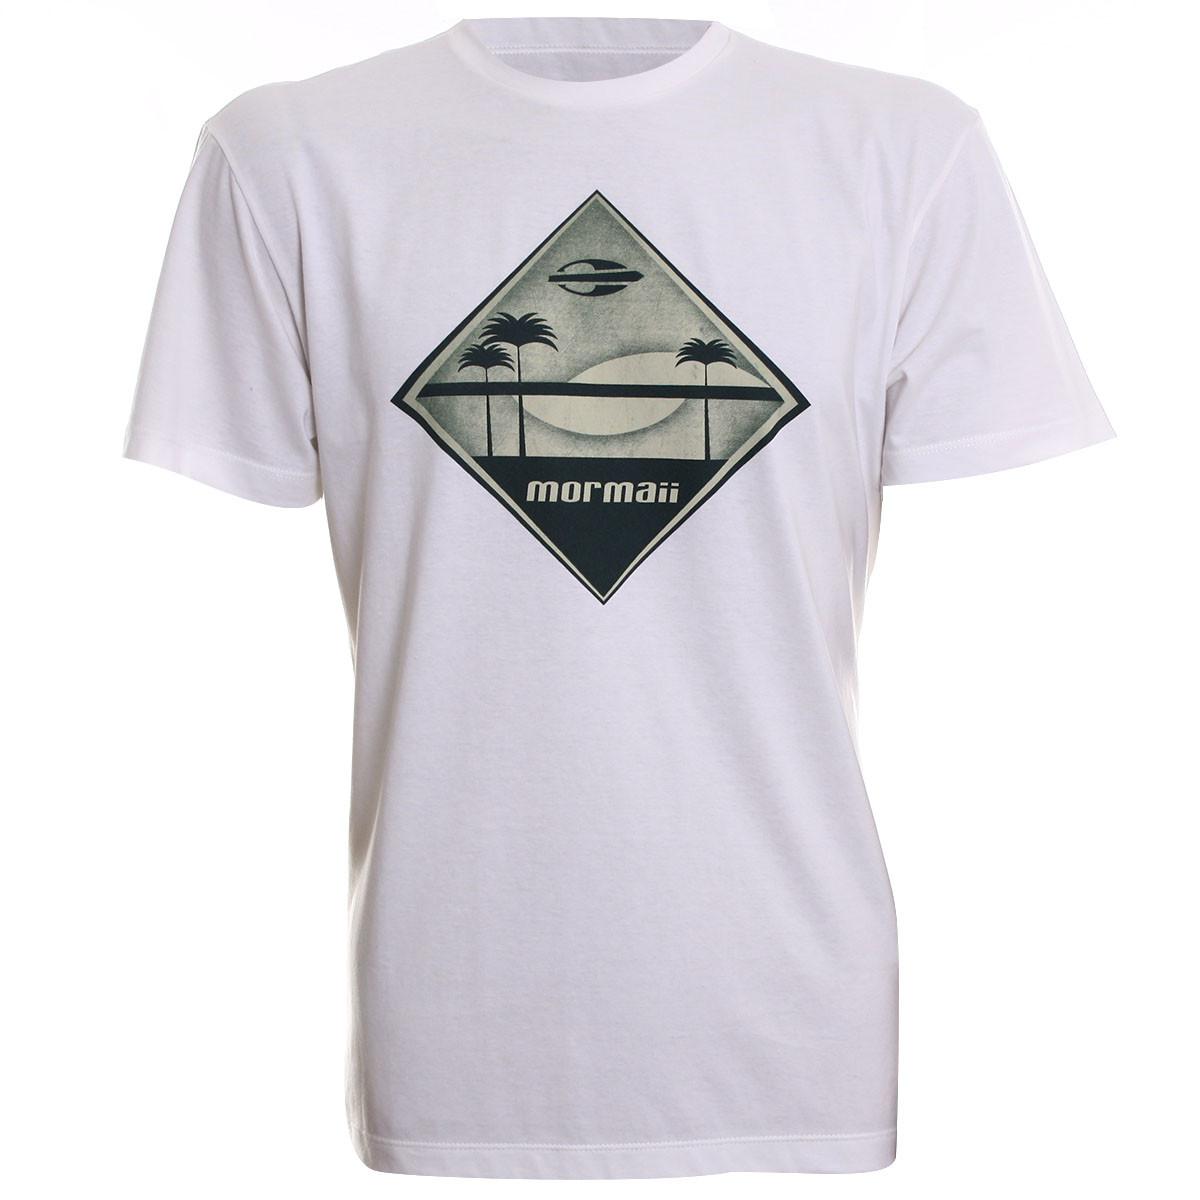 89de620aa7668 Camiseta Mormaii Dusk to Dawn Creme LANÇAMENTO